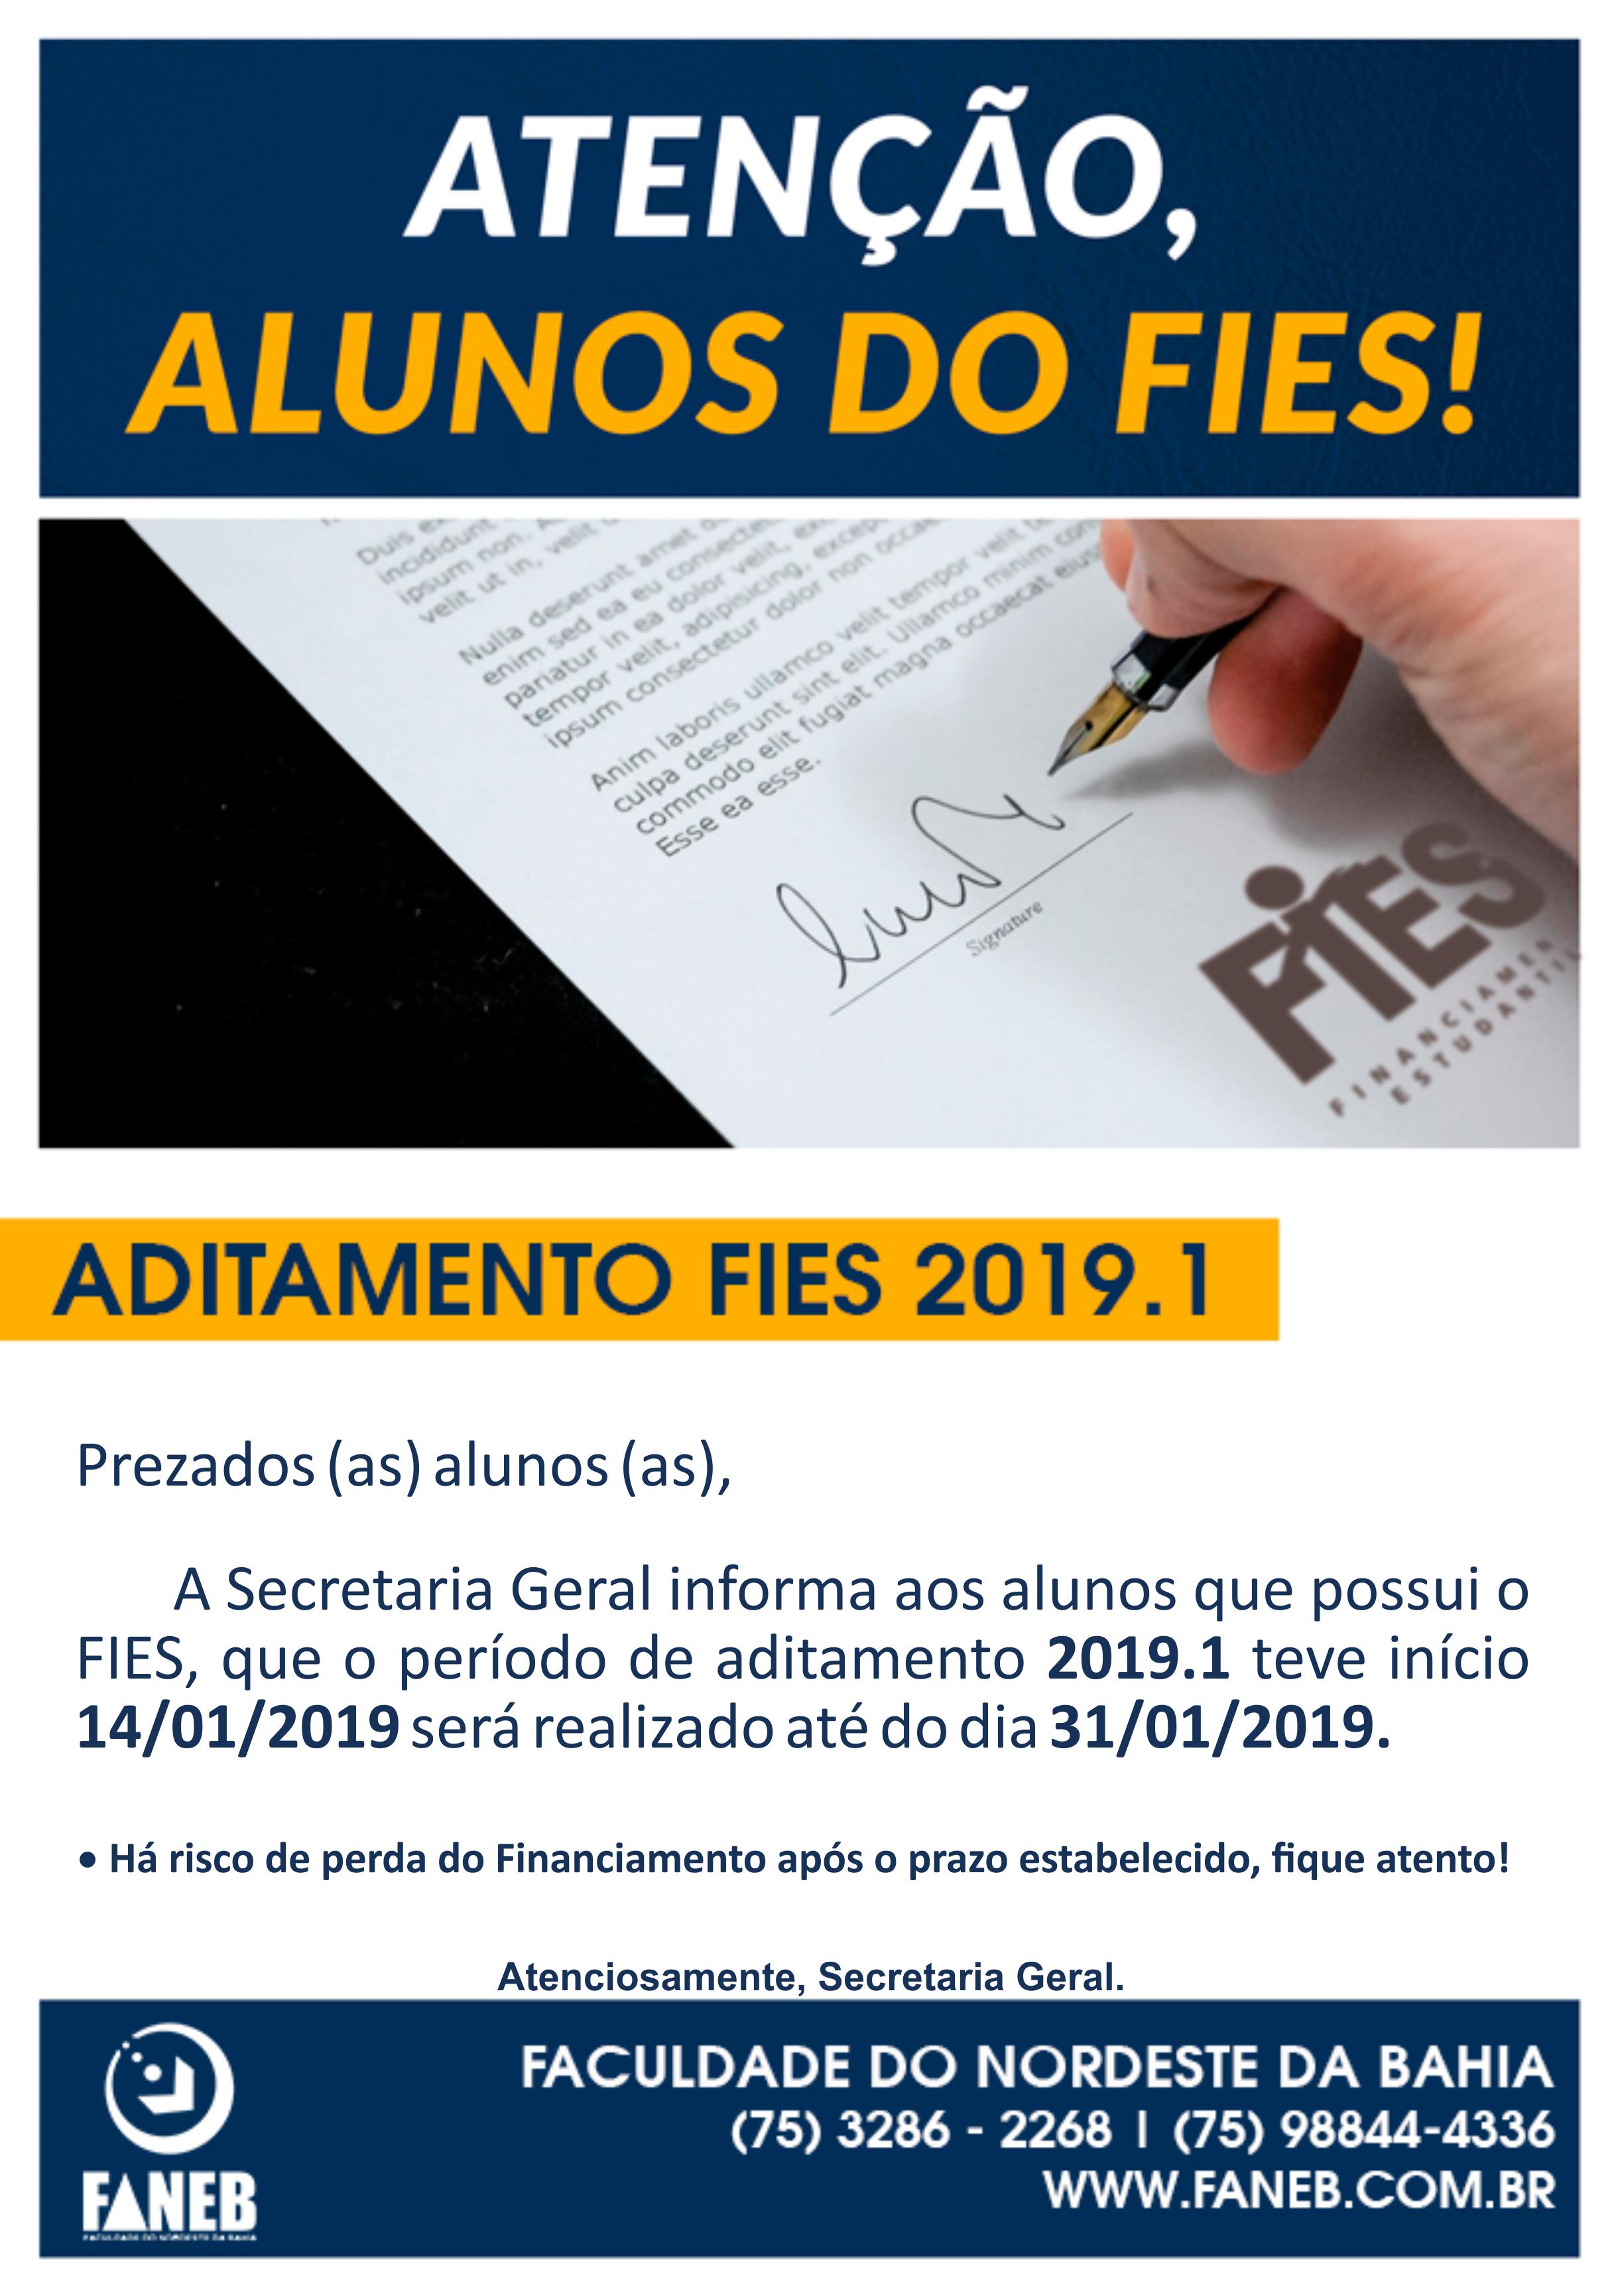 Aviso do FIES - 2019.1